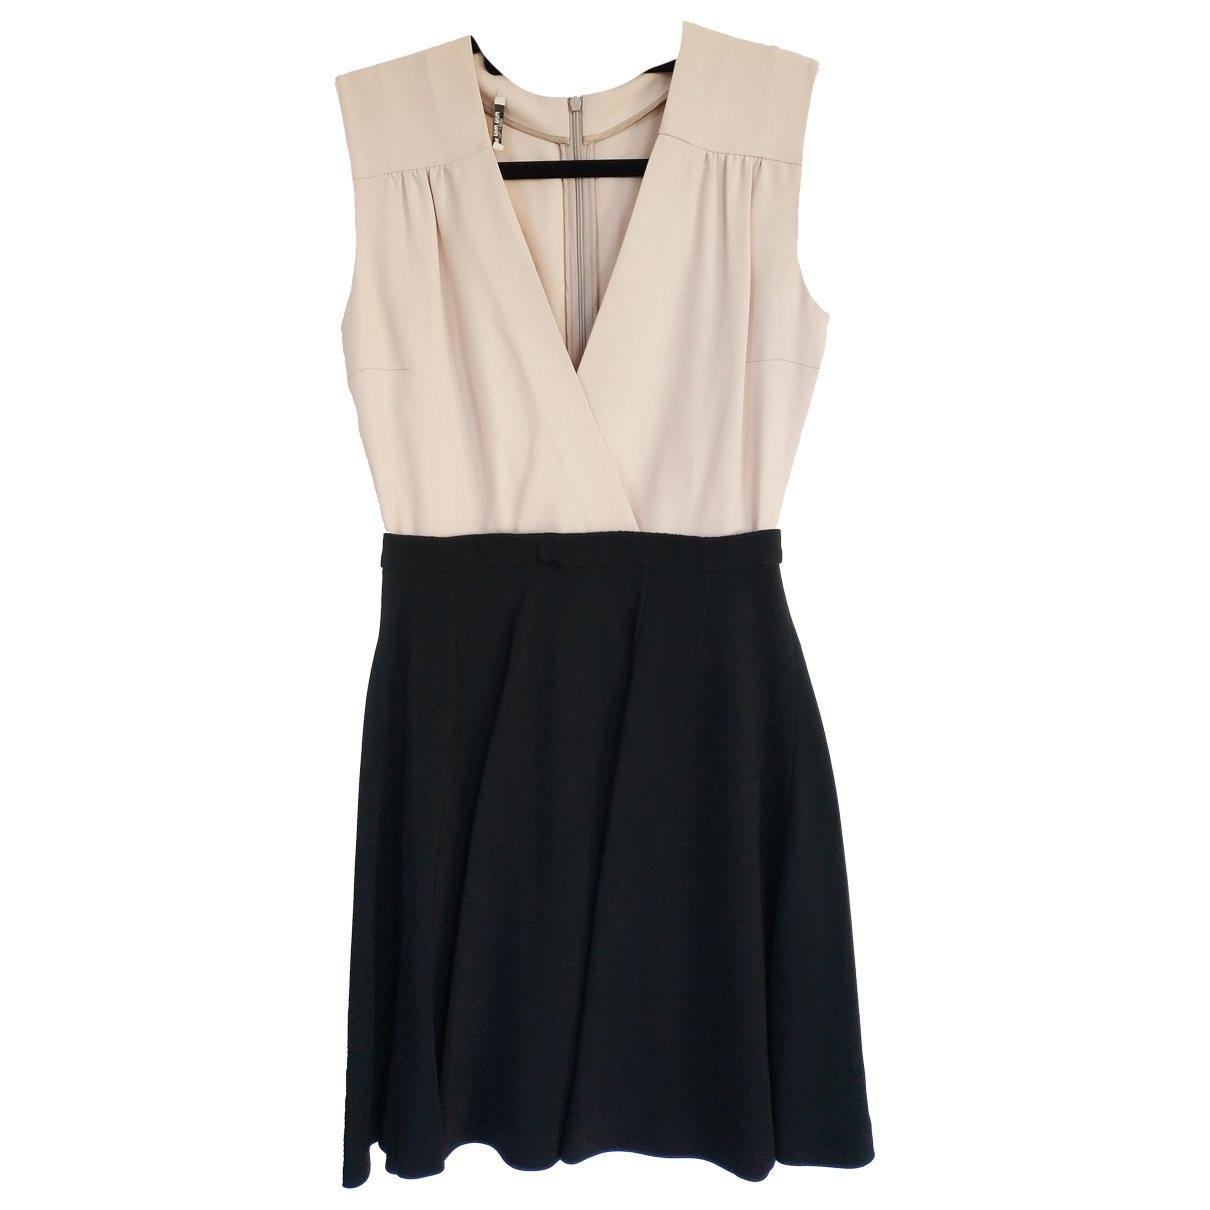 Miu Miu \N Multicolour dress for Women 38 FR